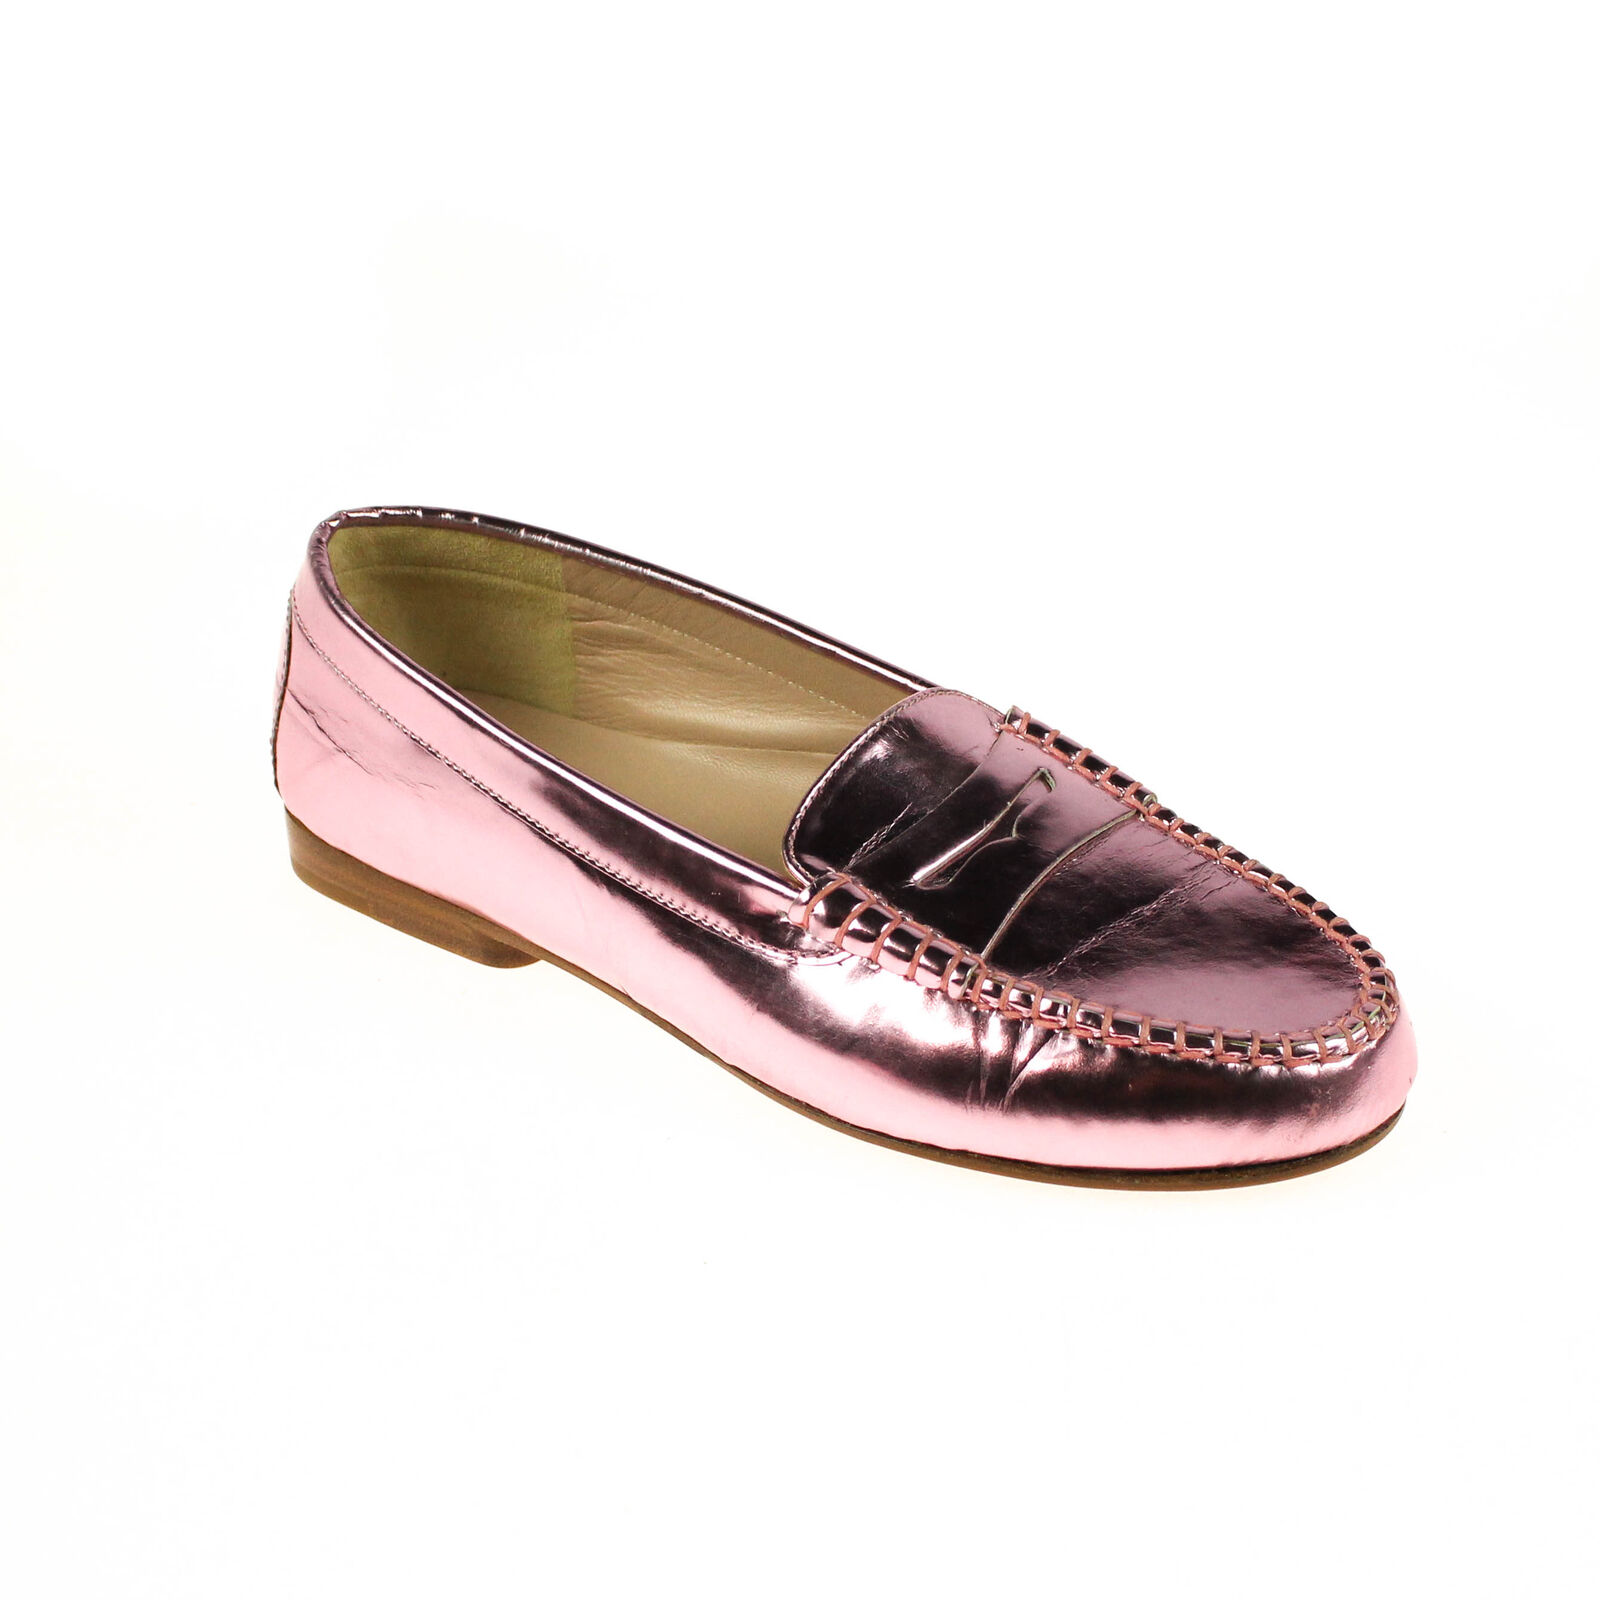 2. choix Verni unützer Femmes Chaussure Slipper Cuir Verni choix Rose Taille 36 fa8981